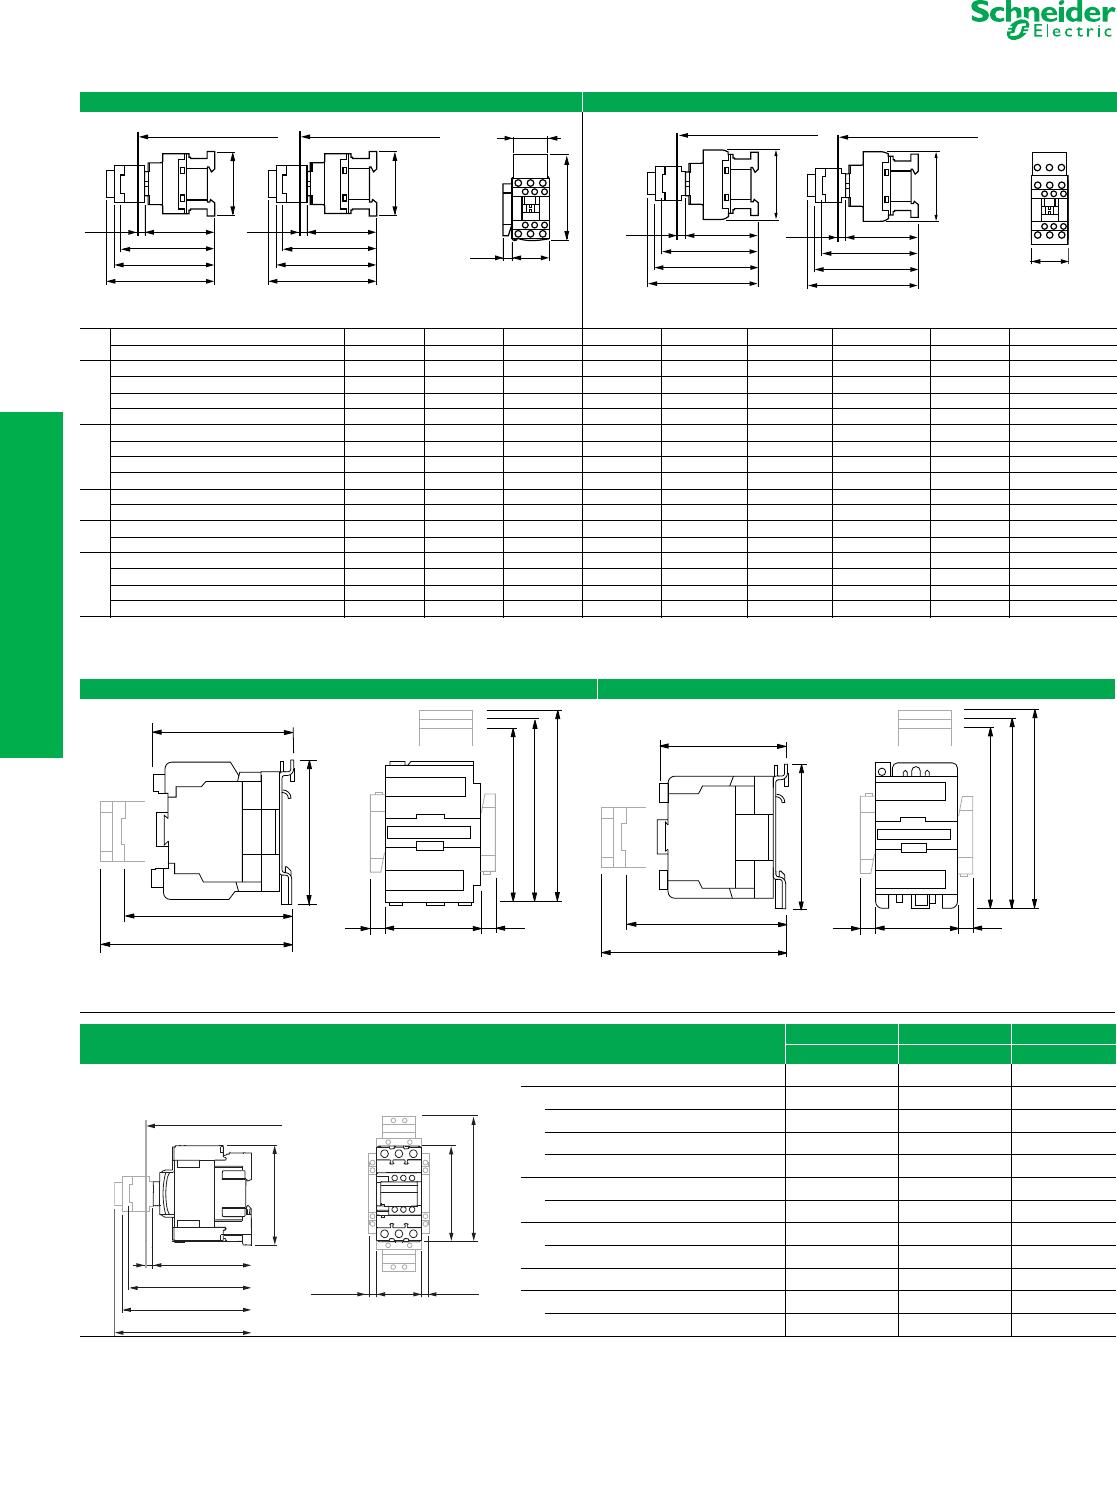 H● Schneider LADR2 Time Delay Block  0.1-30s New in box